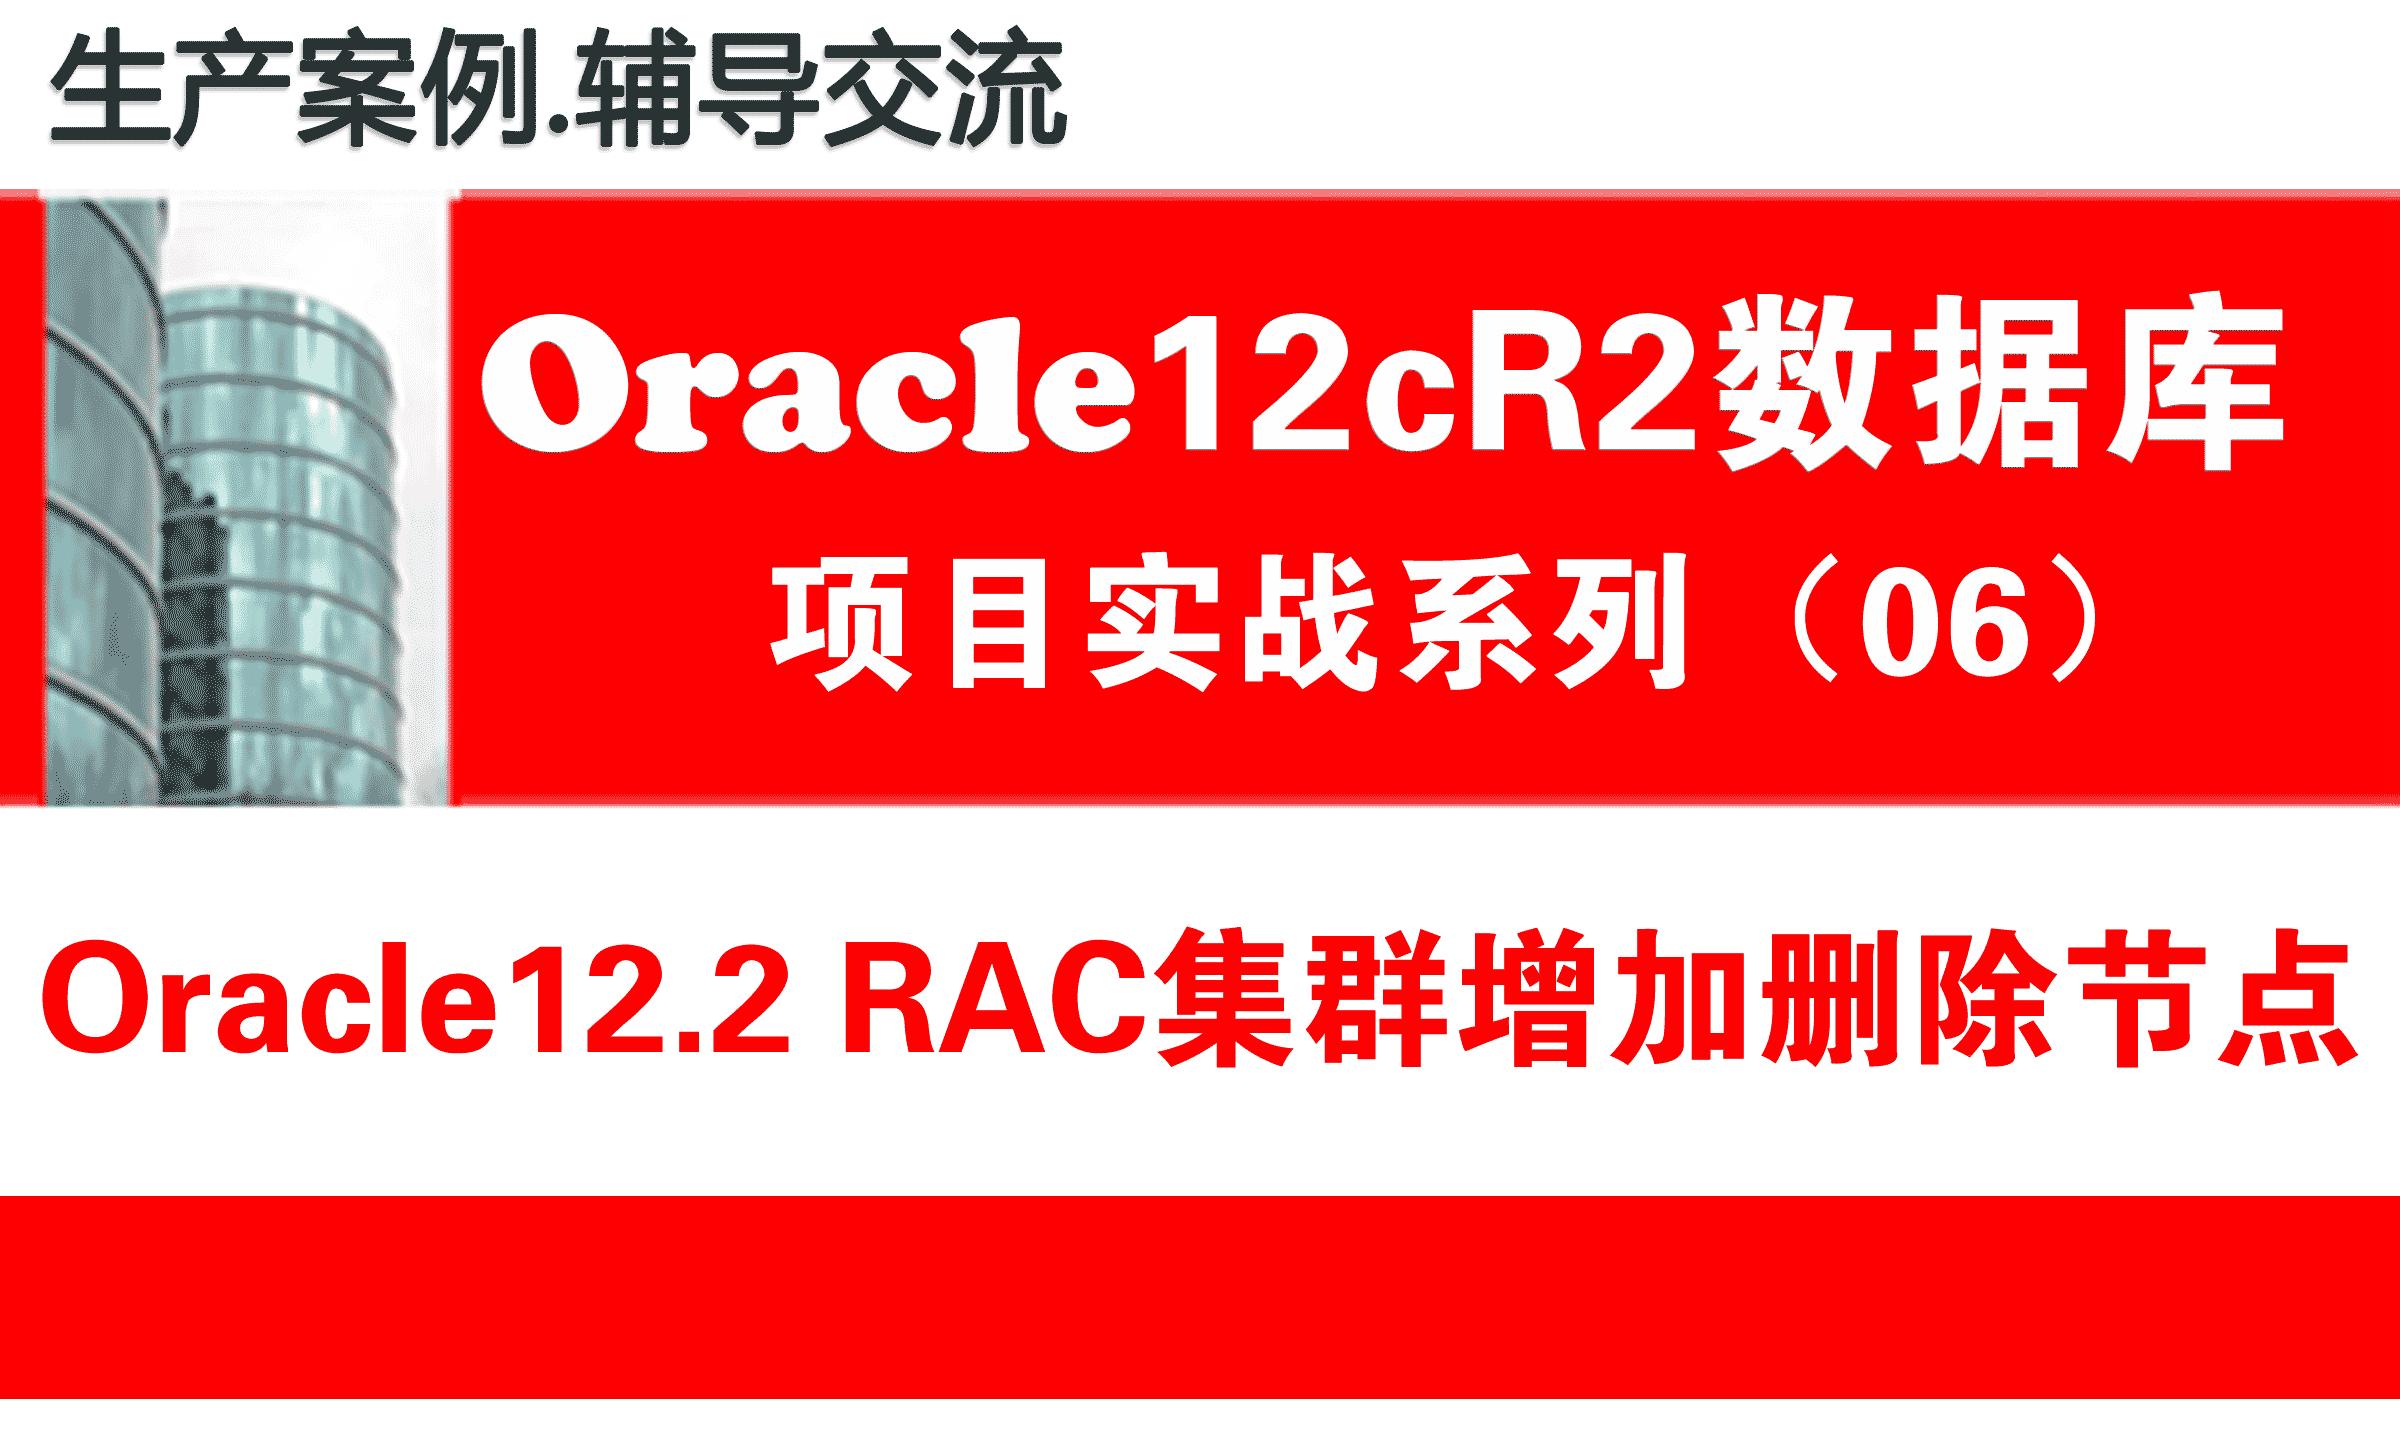 Oracle12c数据库培训教程06:Oracle12c RAC集群管理之RAC集群增加删除节点